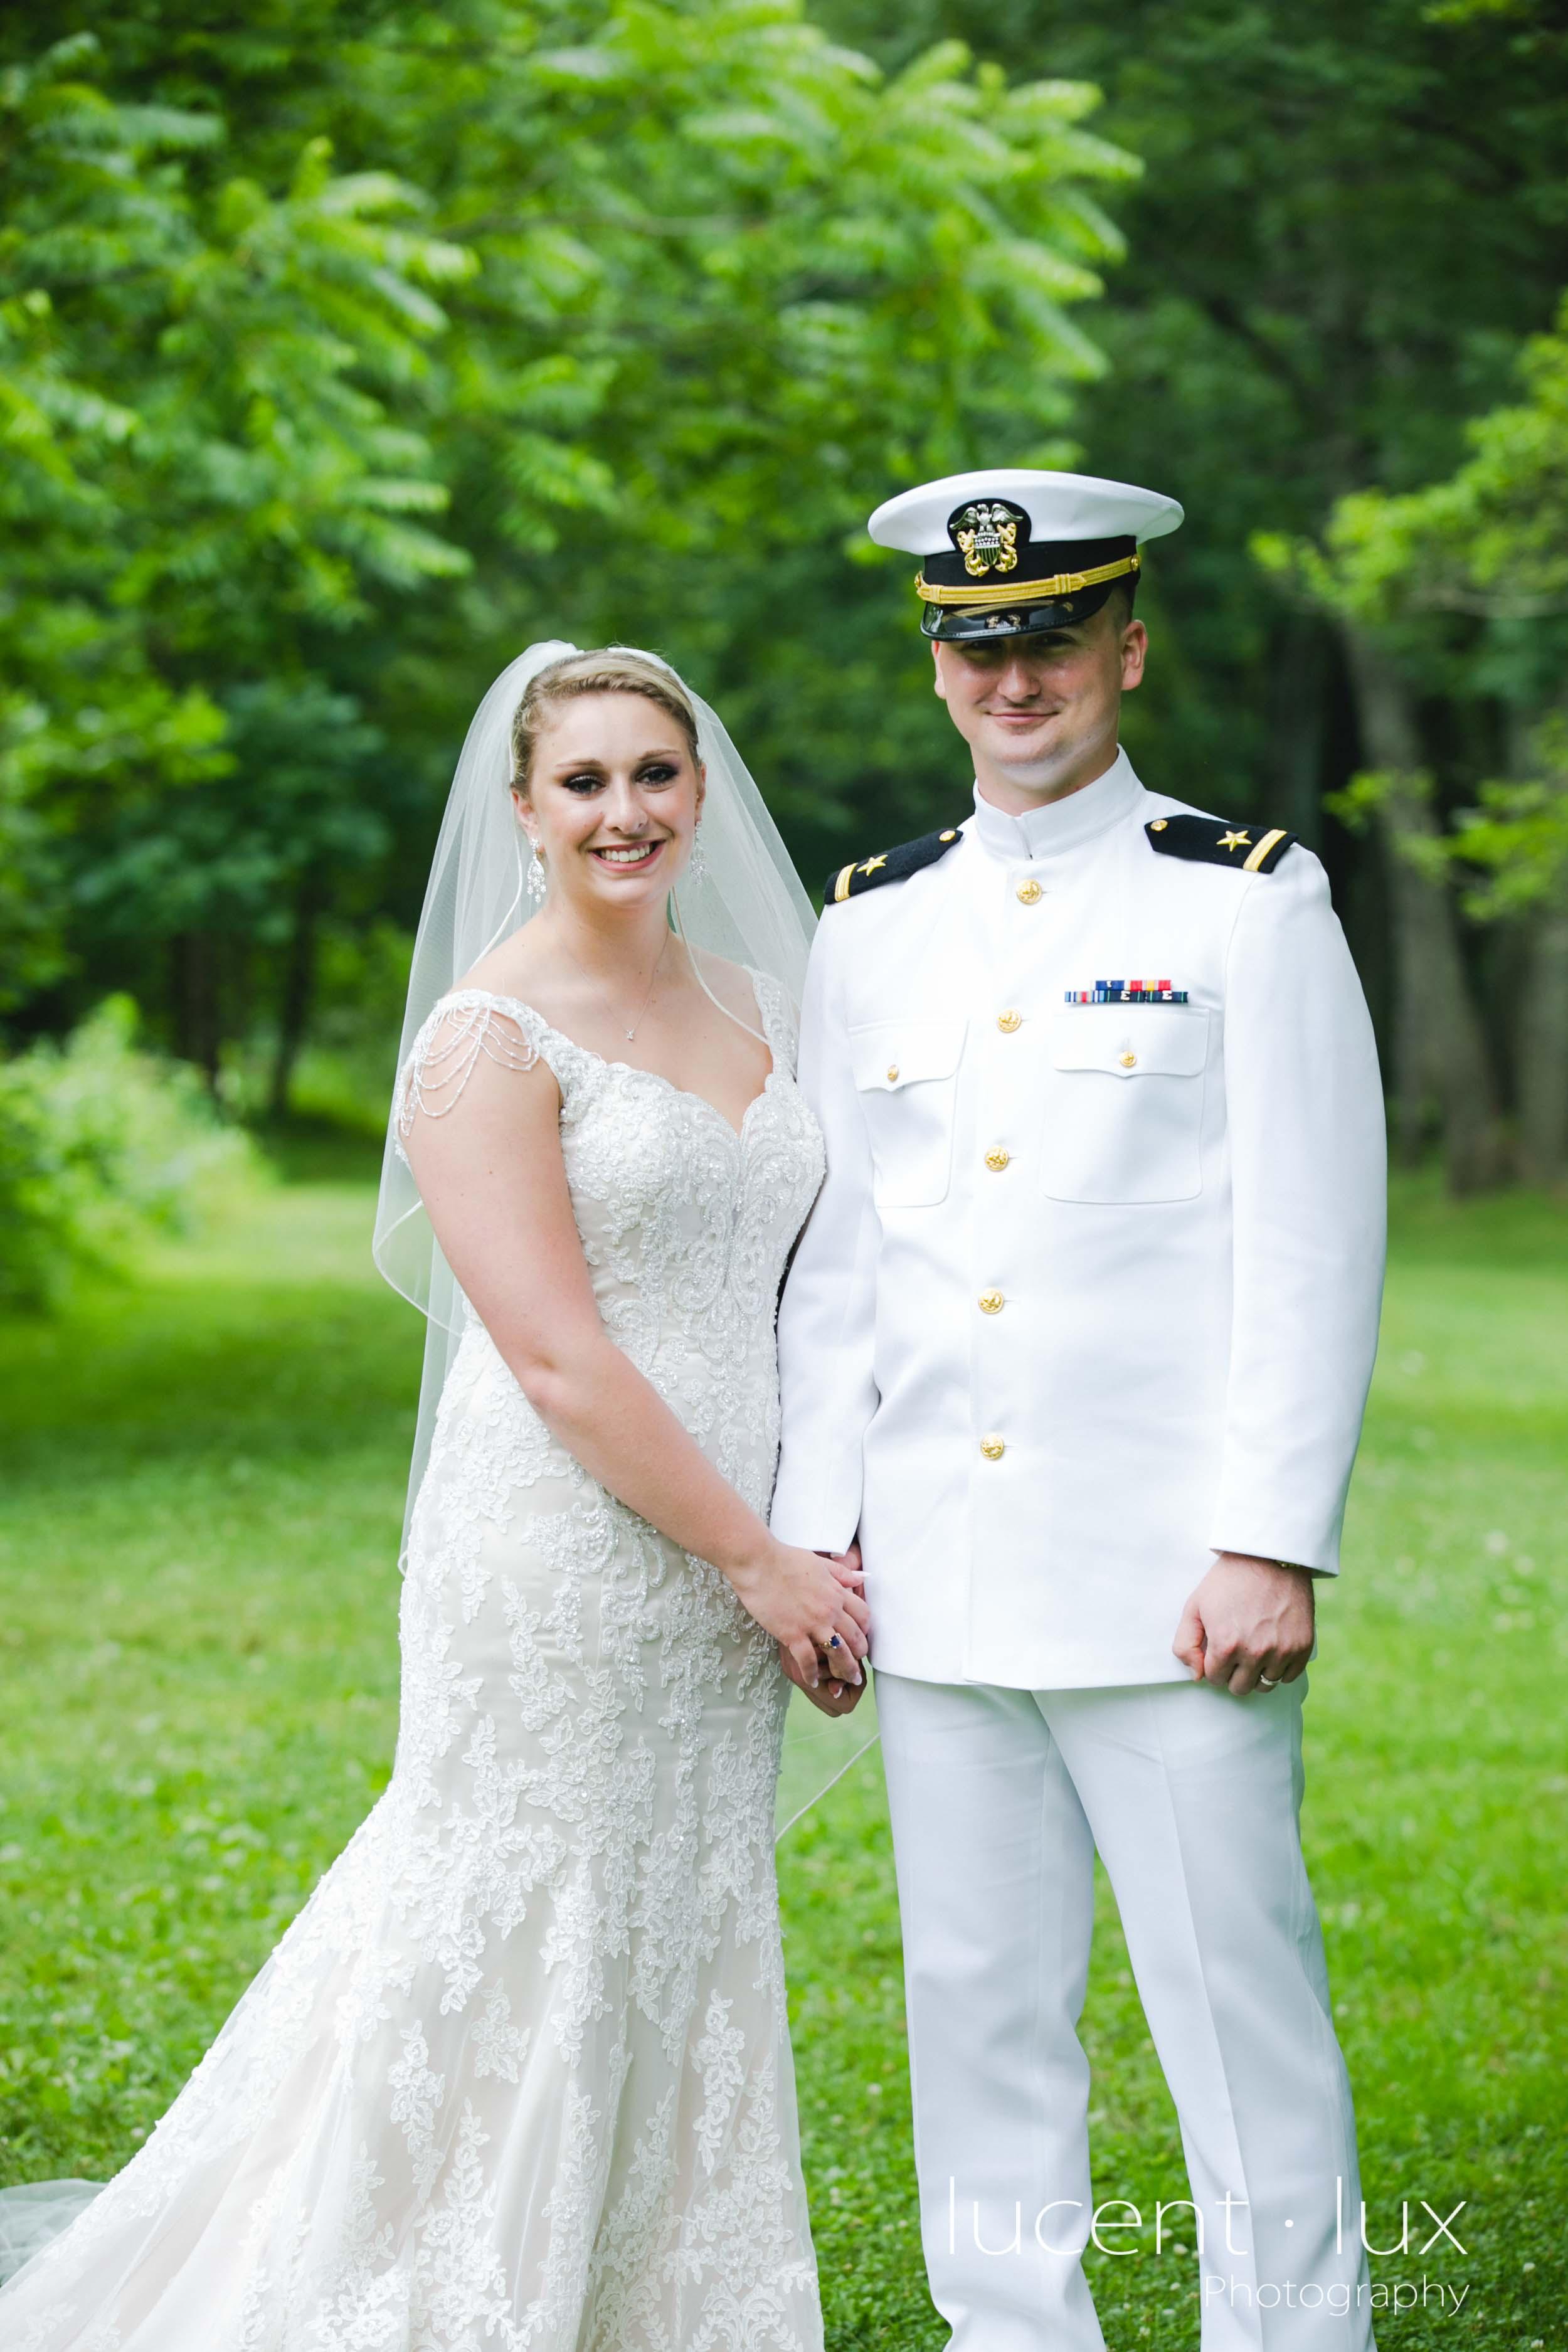 Wedding-Photography-Maryland-Pennsylvania-Photographer-Mendenhall-Inn-Media-Portrait-Event-134.jpg